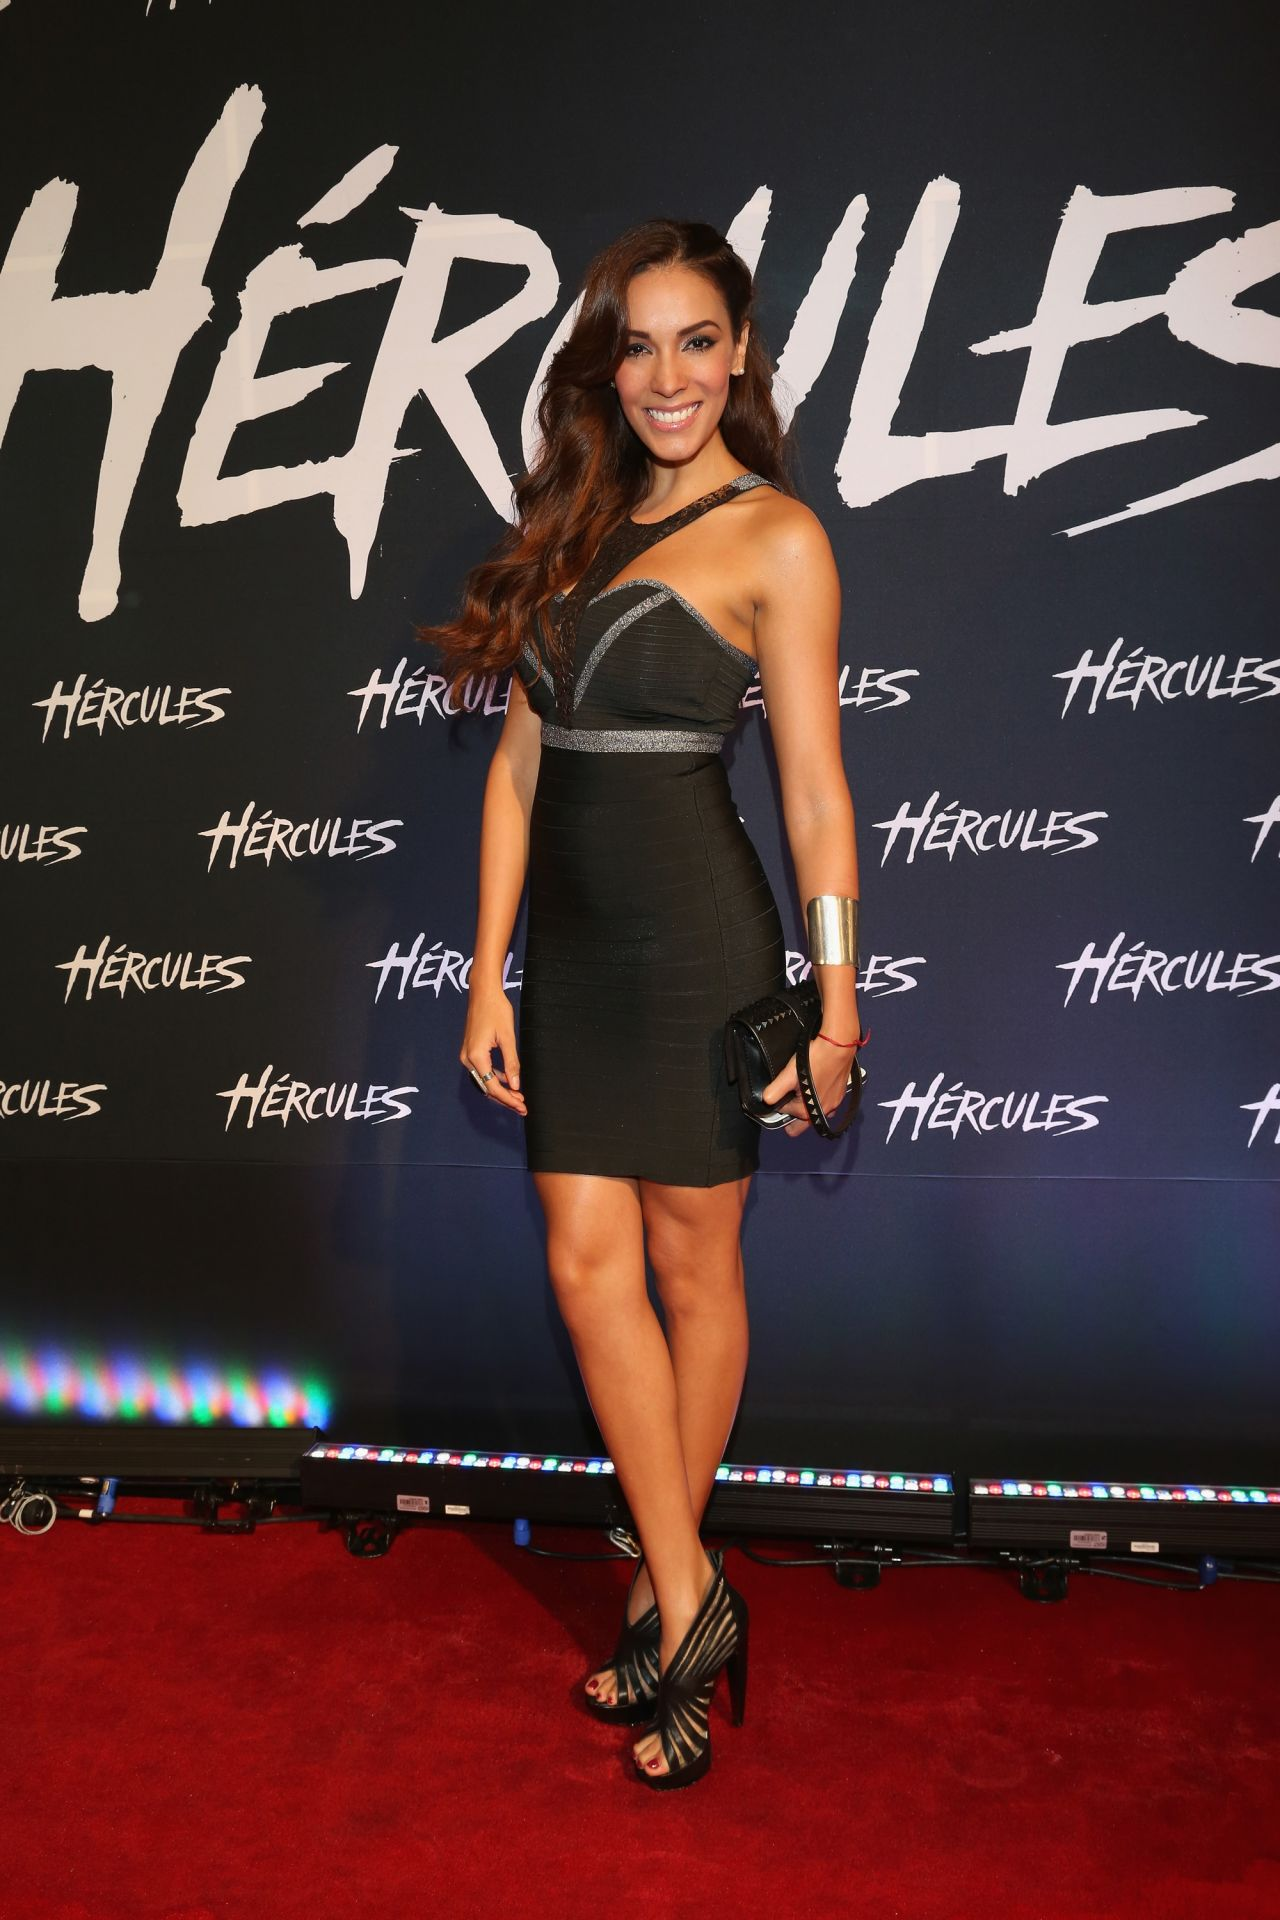 Carolina Moran Hercules Premiere In Mexico City